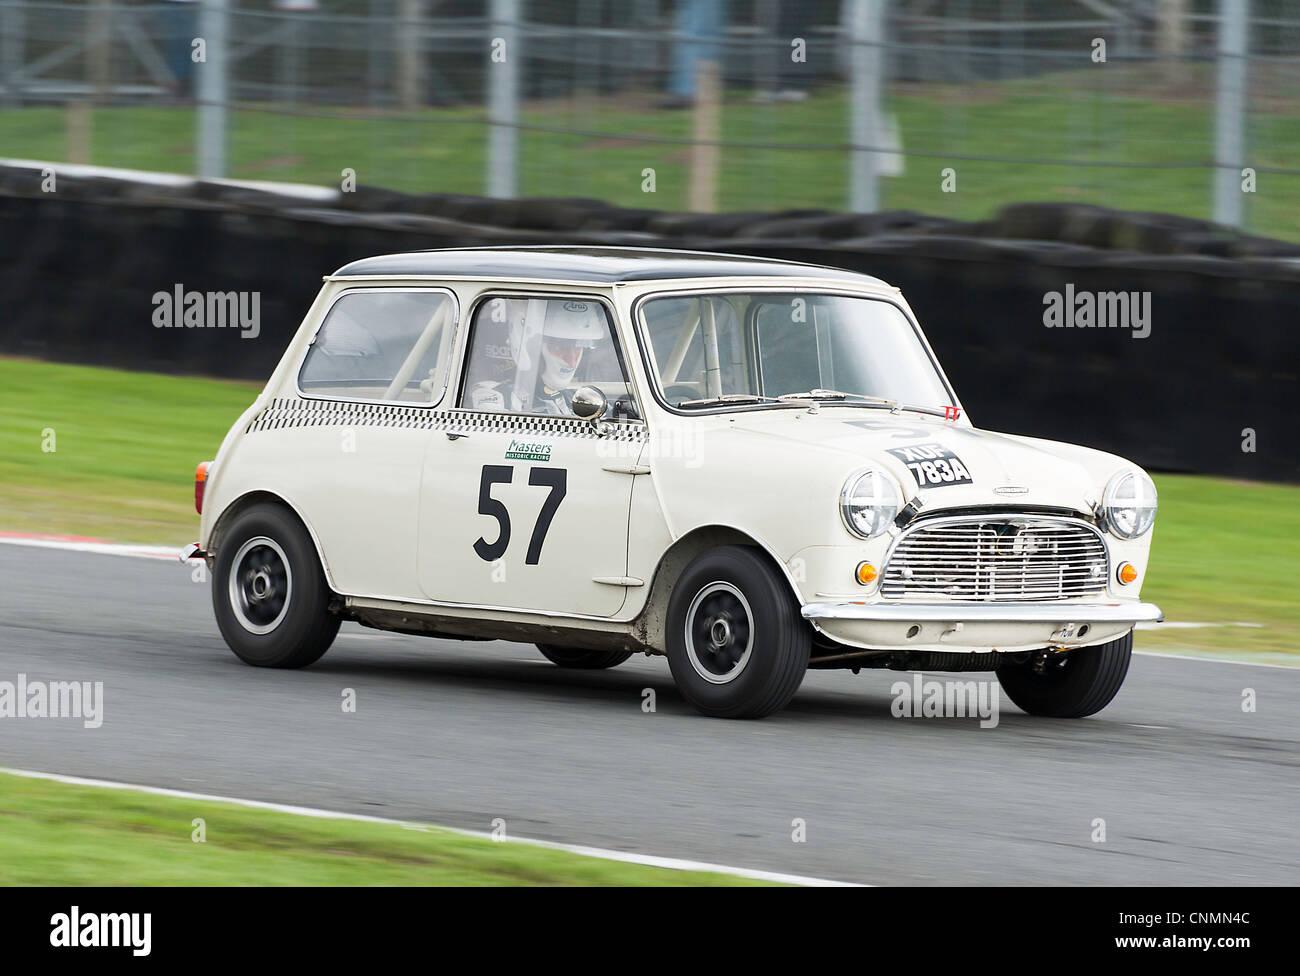 Austin Mini Cooper S Race Car at Oulton Park Motor Racing Circuit ...